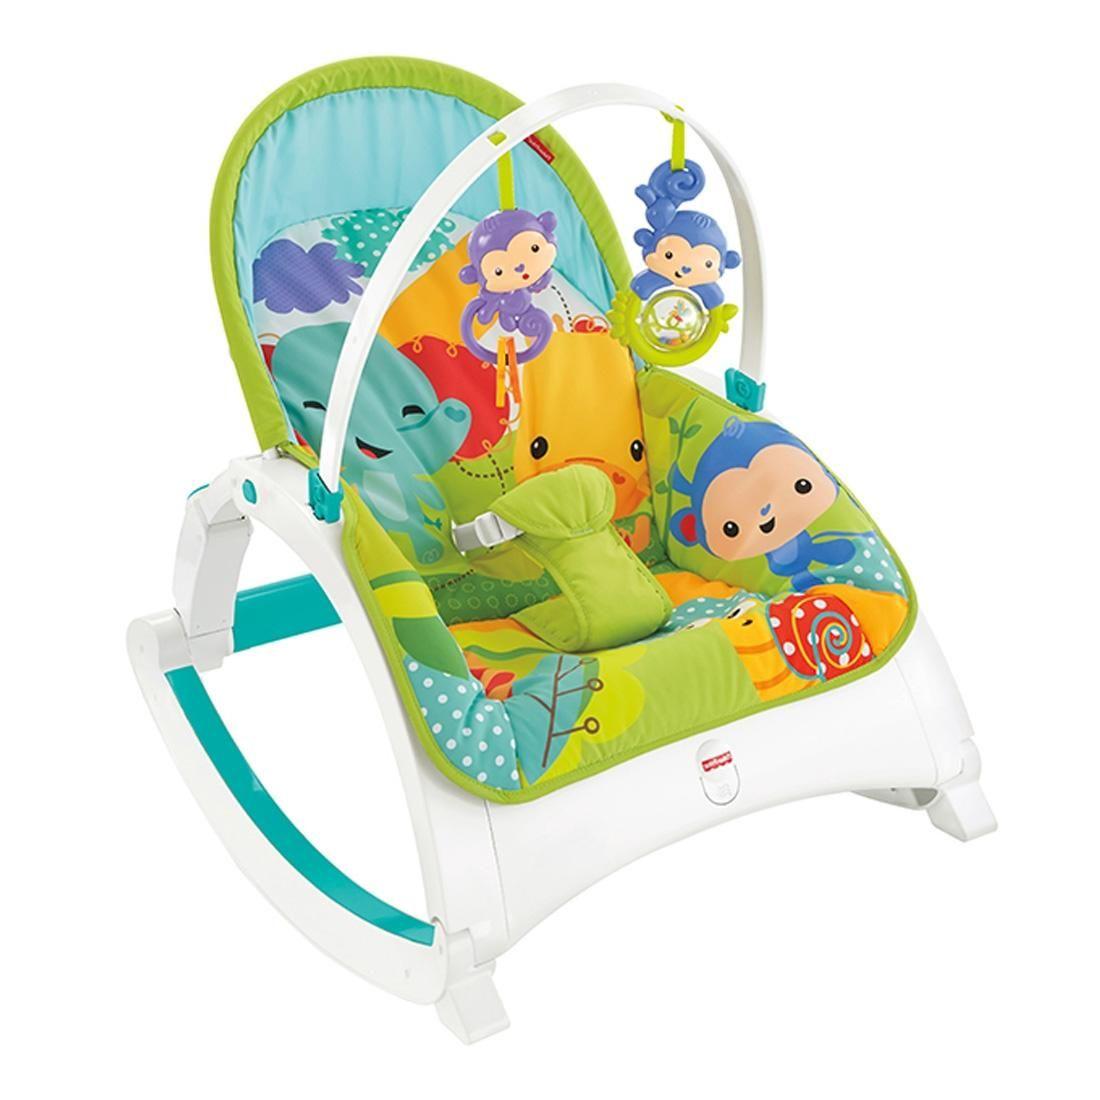 Baby rocker chair fisher price - Fisher Price Newborn To Toddler Rocker Kiddicare Com